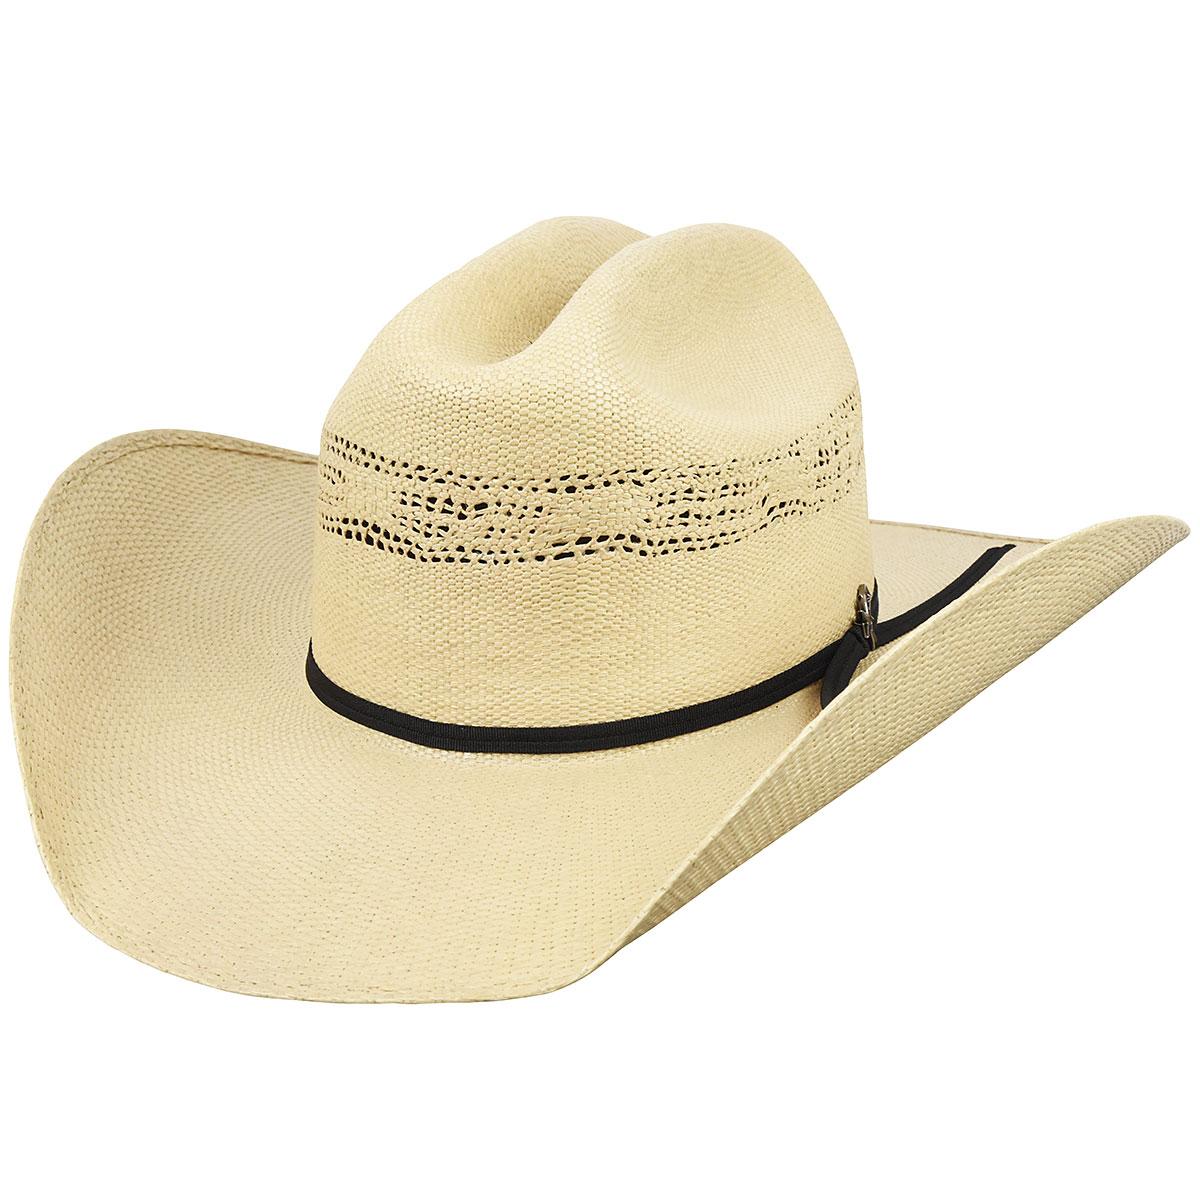 Bailey Western Costa Western Hat in Rustic